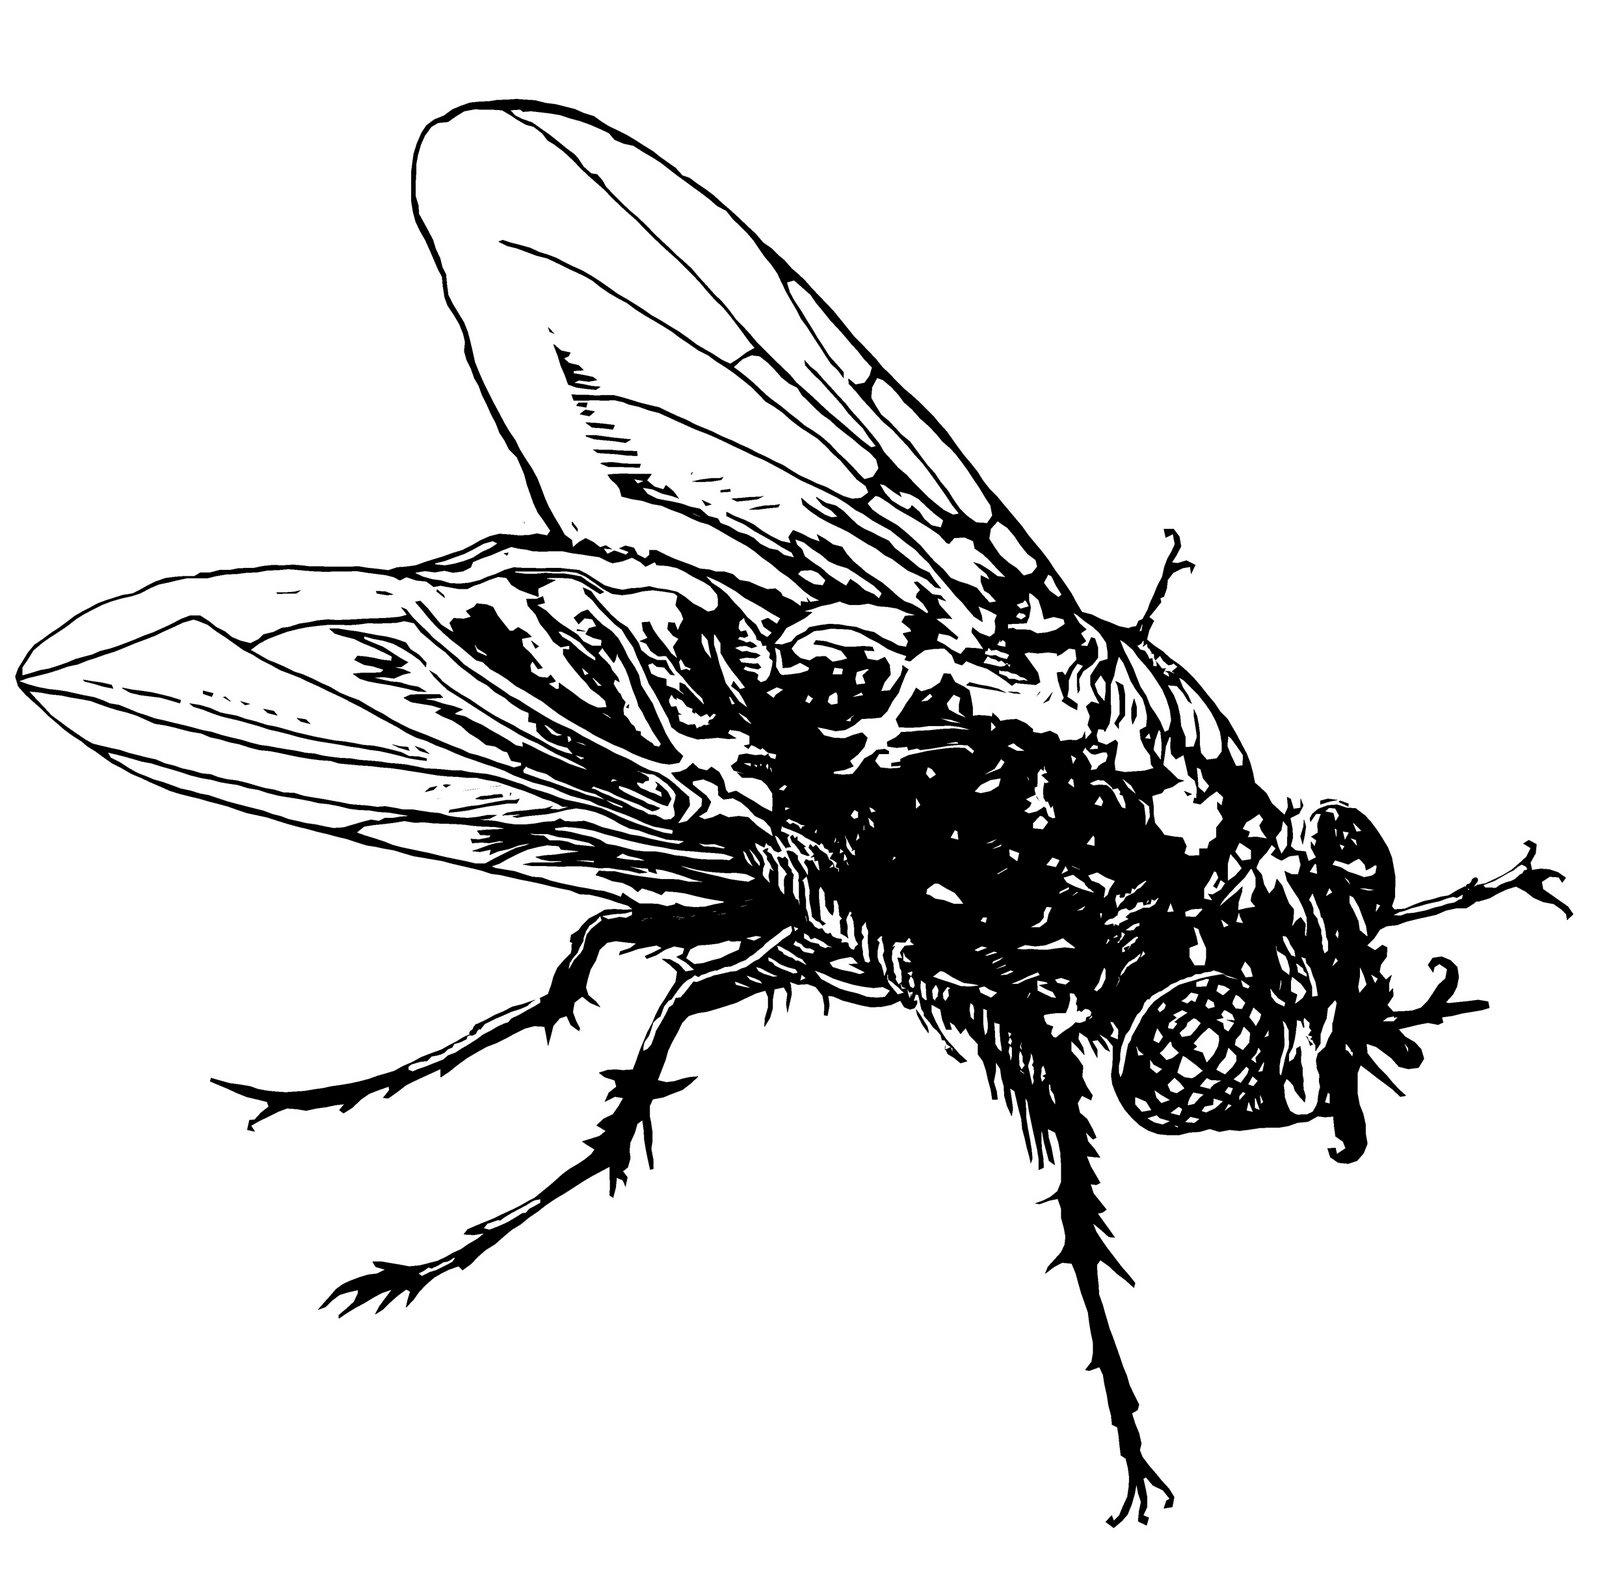 Fly Beautiful Image Drawing | Drawing Skill